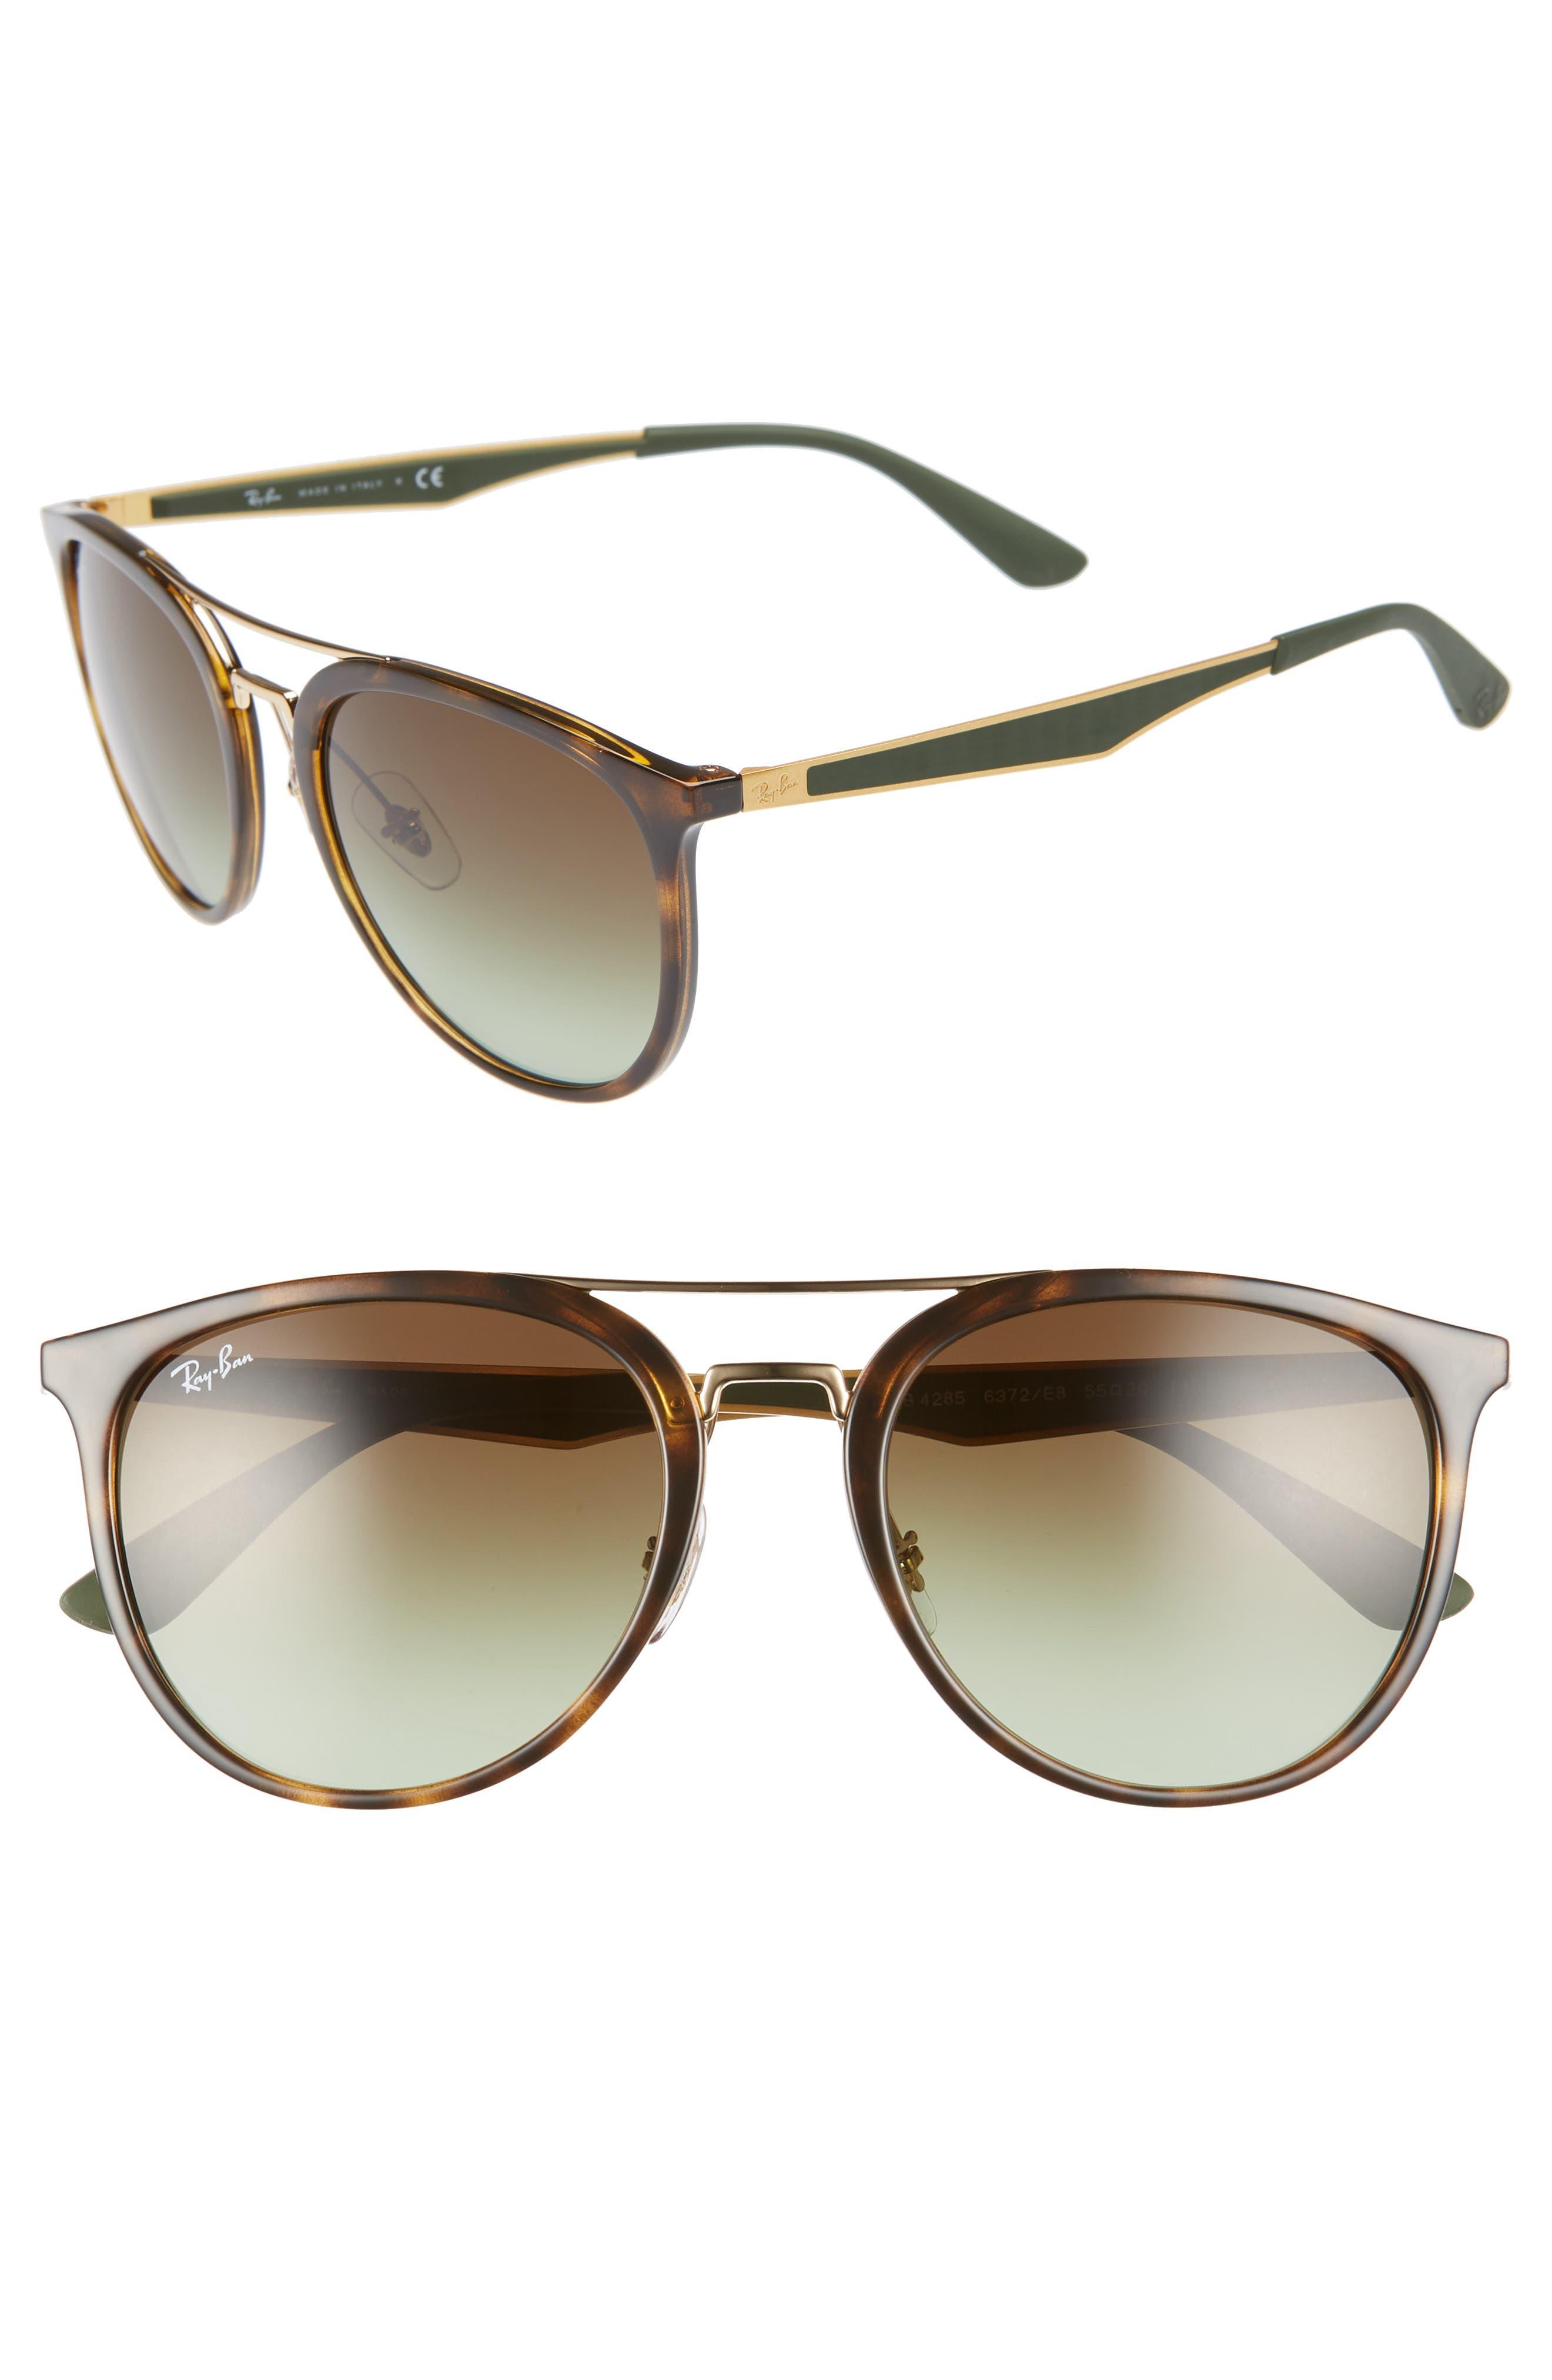 55mm Retro Sunglasses,                             Main thumbnail 1, color,                             HAVANA